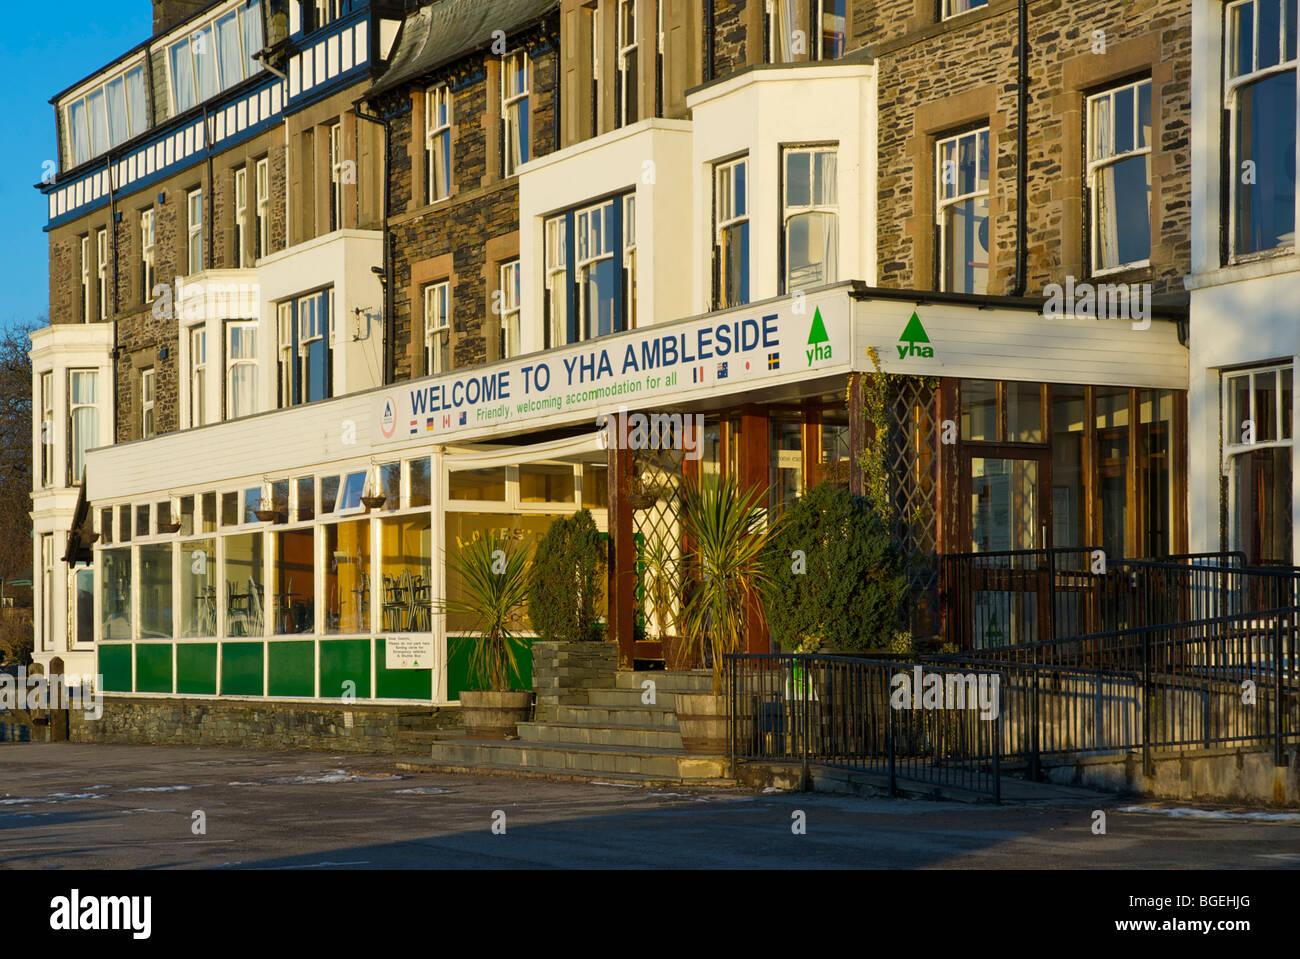 Ambleside Youth Hostel at Waterhead, Lake District National Park, Cumbria, England UK - Stock Image